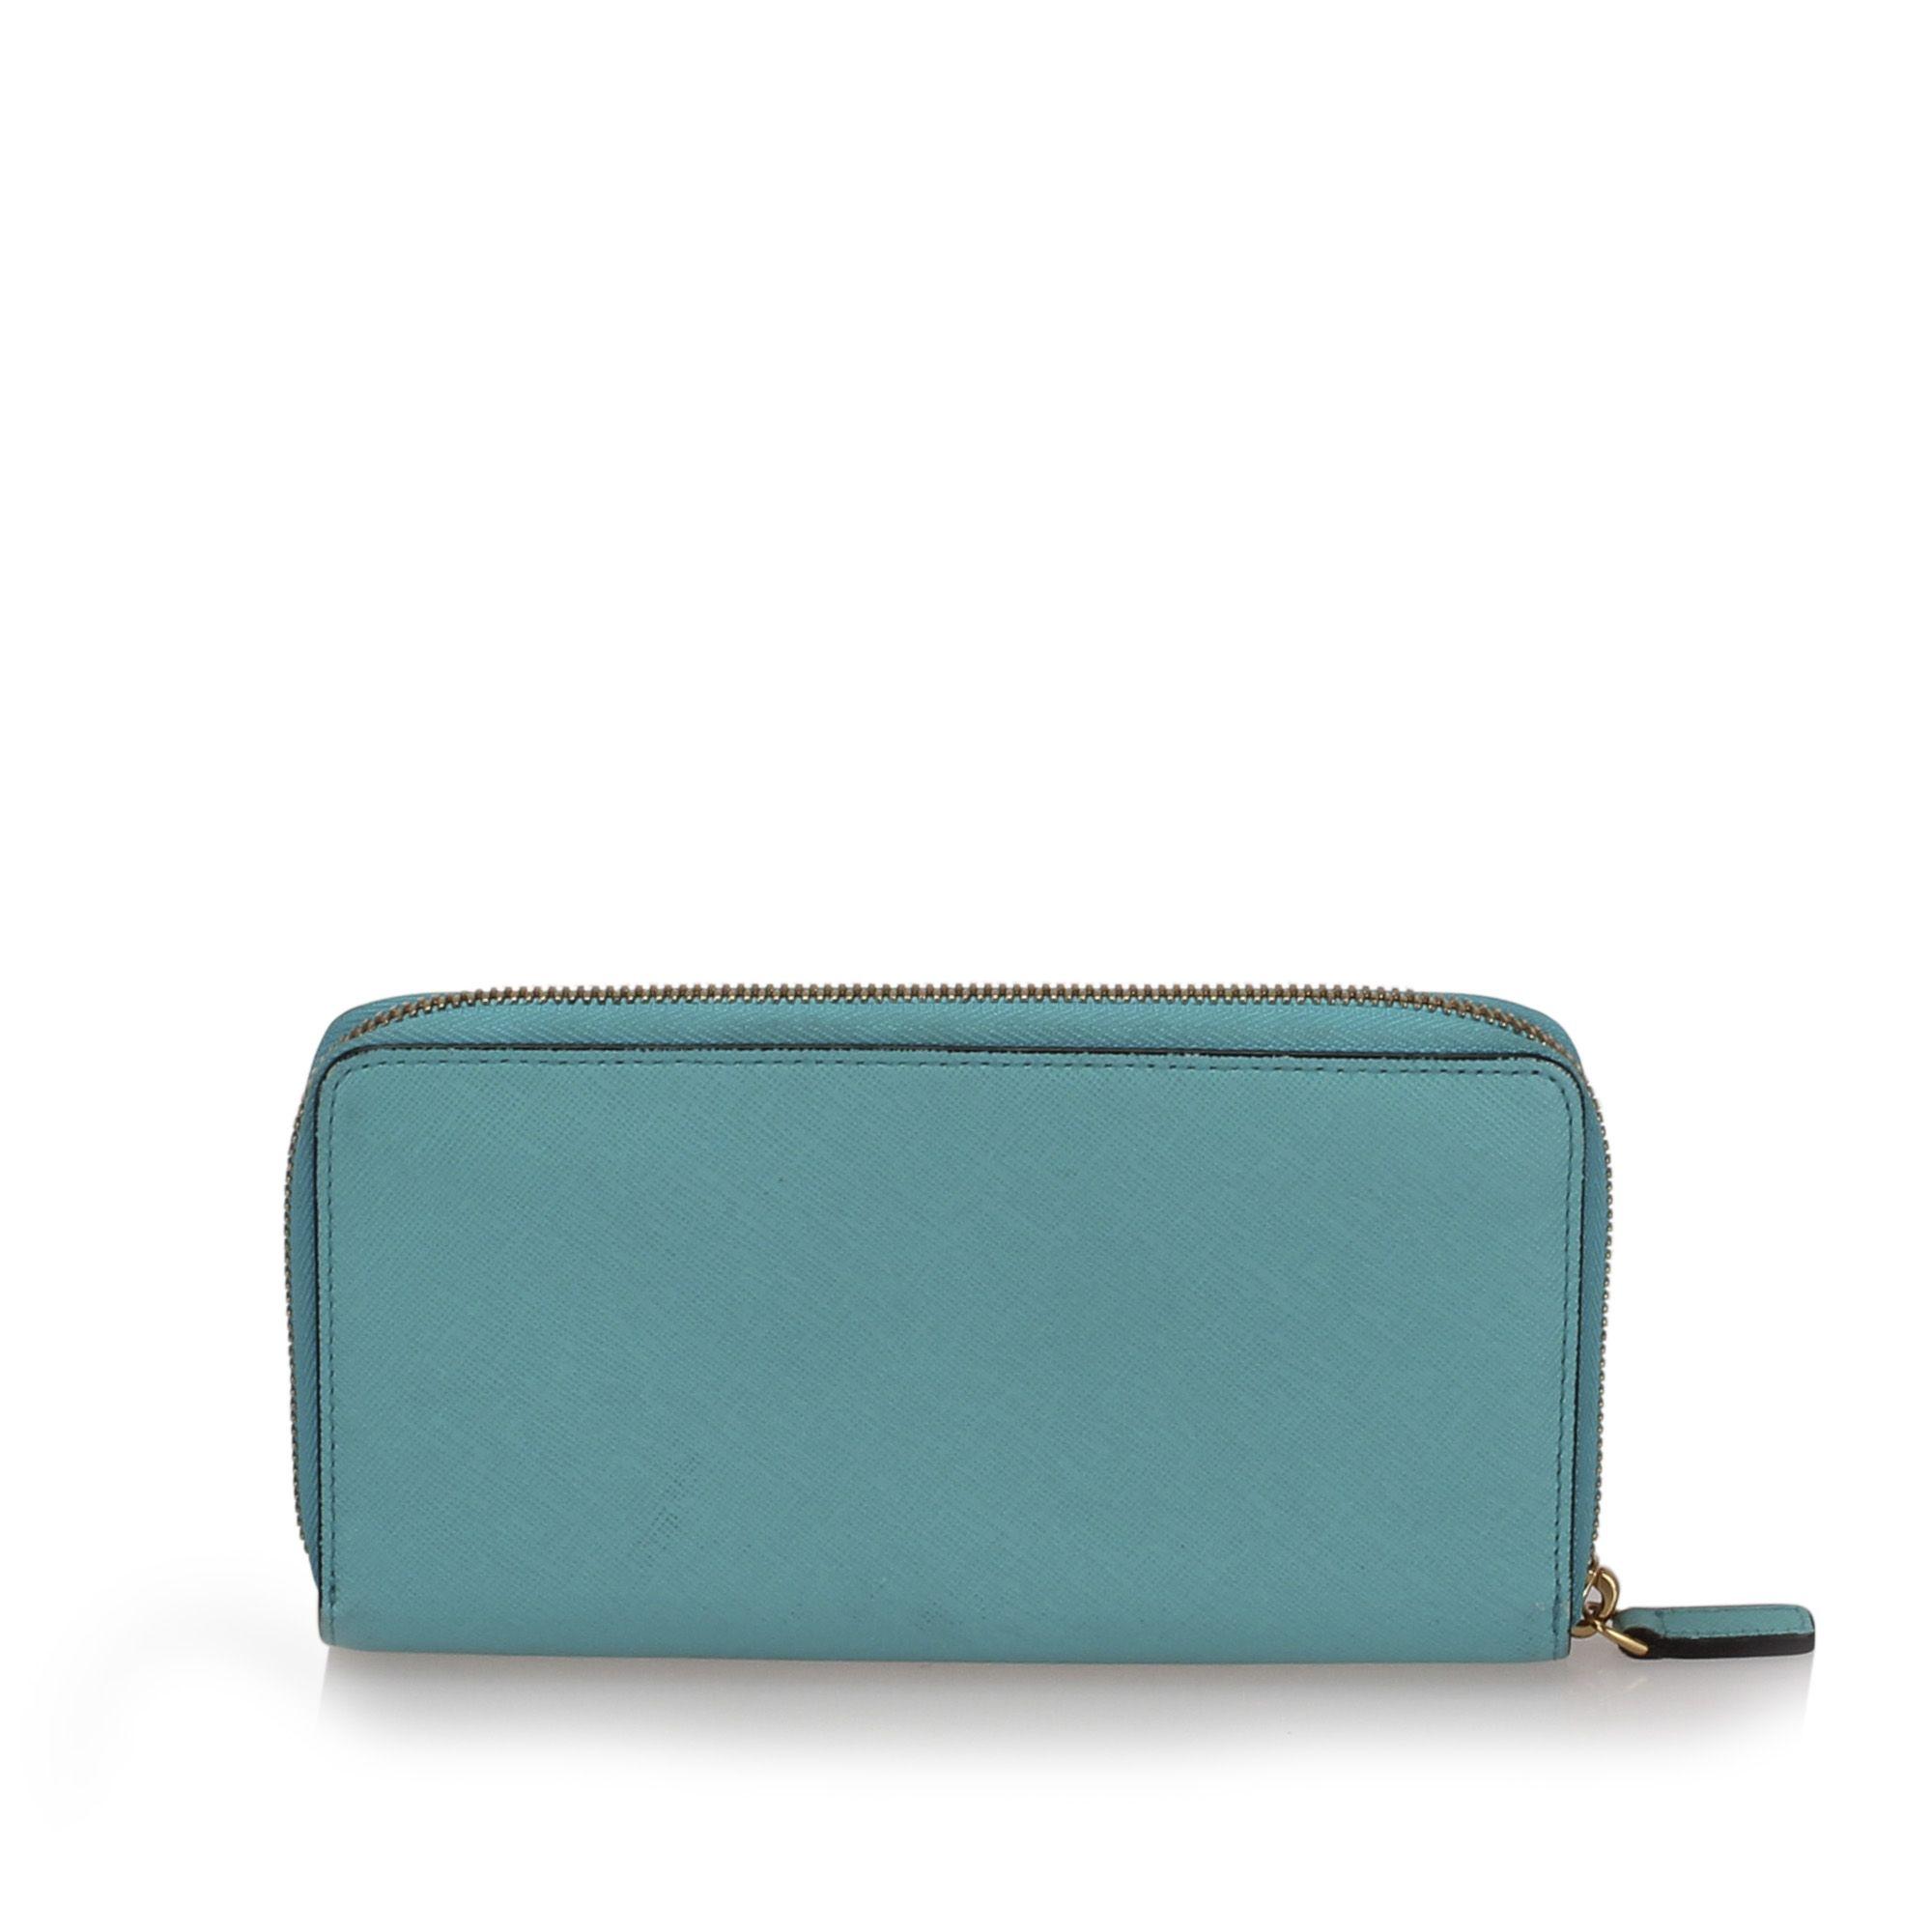 Vintage MCM Leather Zip Around Wallet Blue